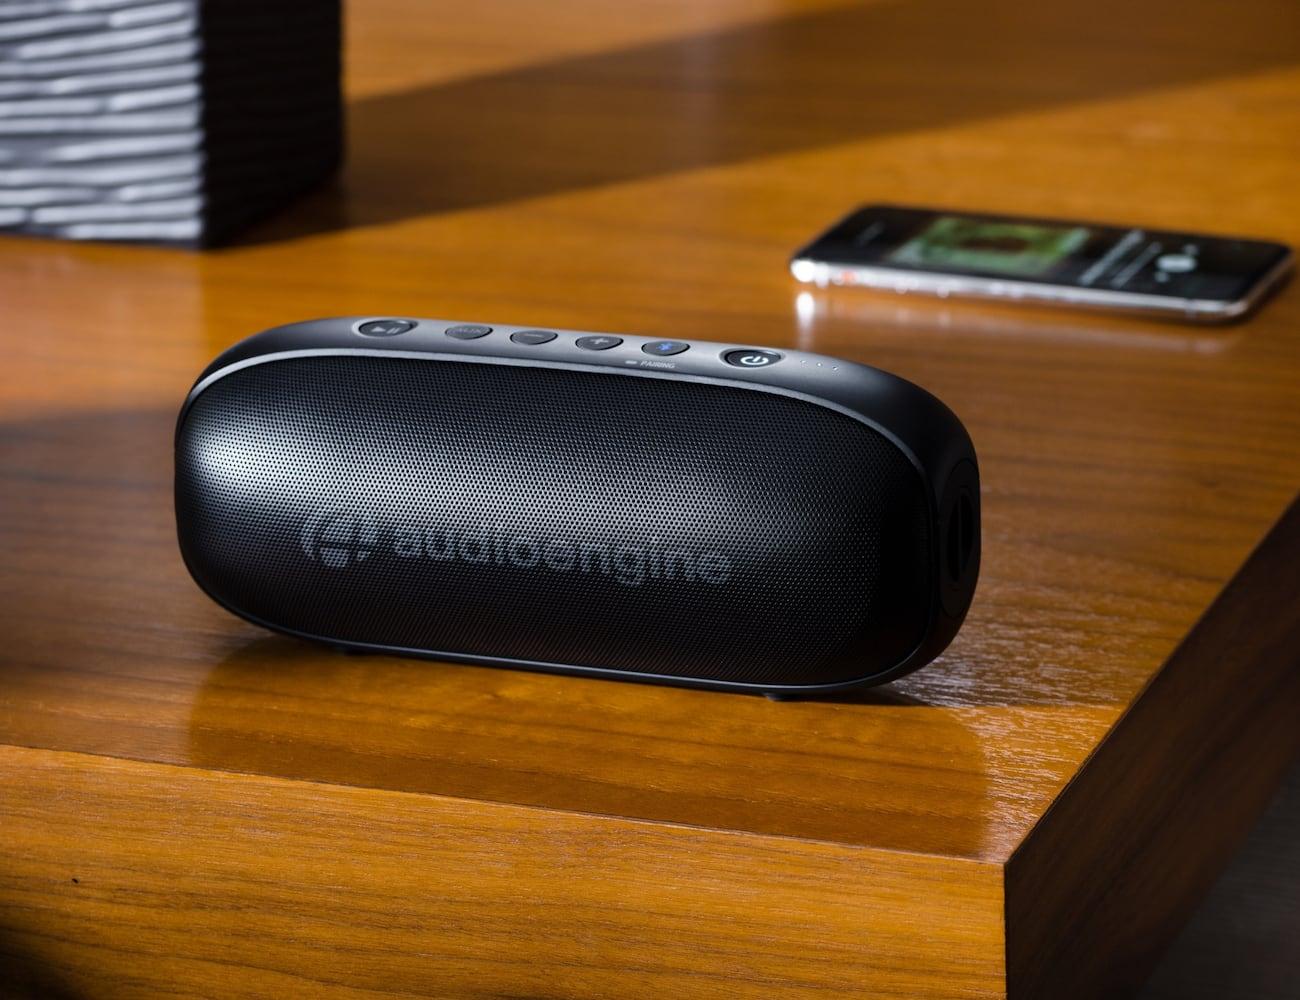 Audioengine 512 Portable Wireless Speaker streams from any device